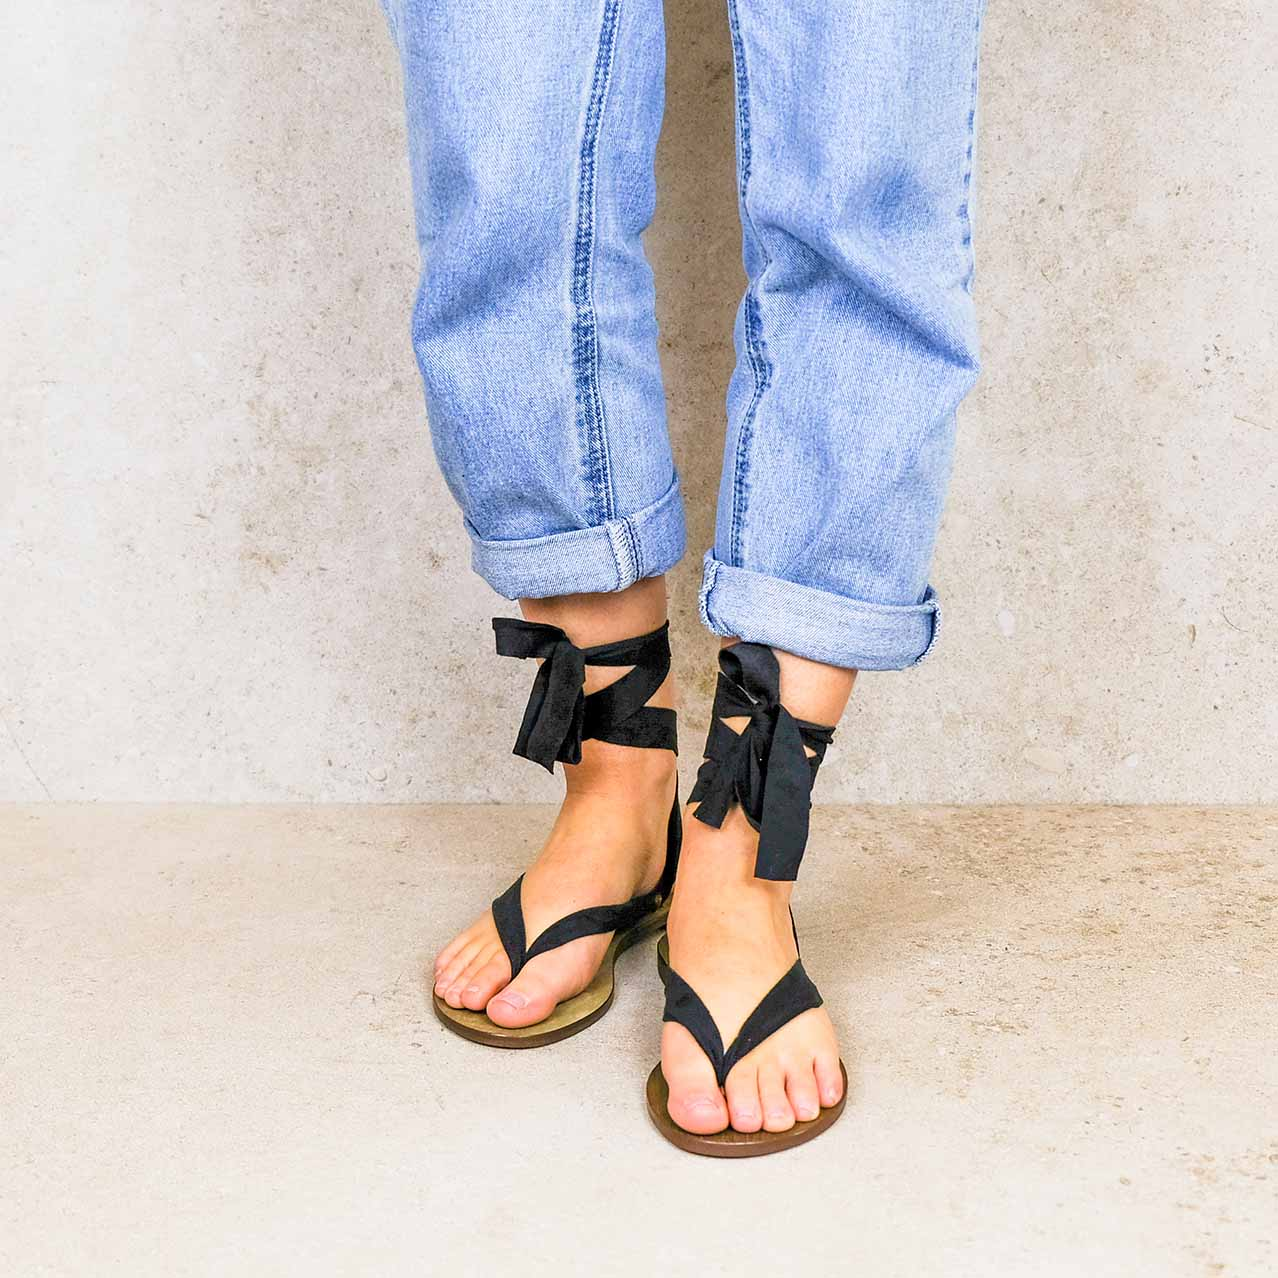 Tulum-lintsandalen sandals travelsandals vegan sustainable sandals wikkelsandalen